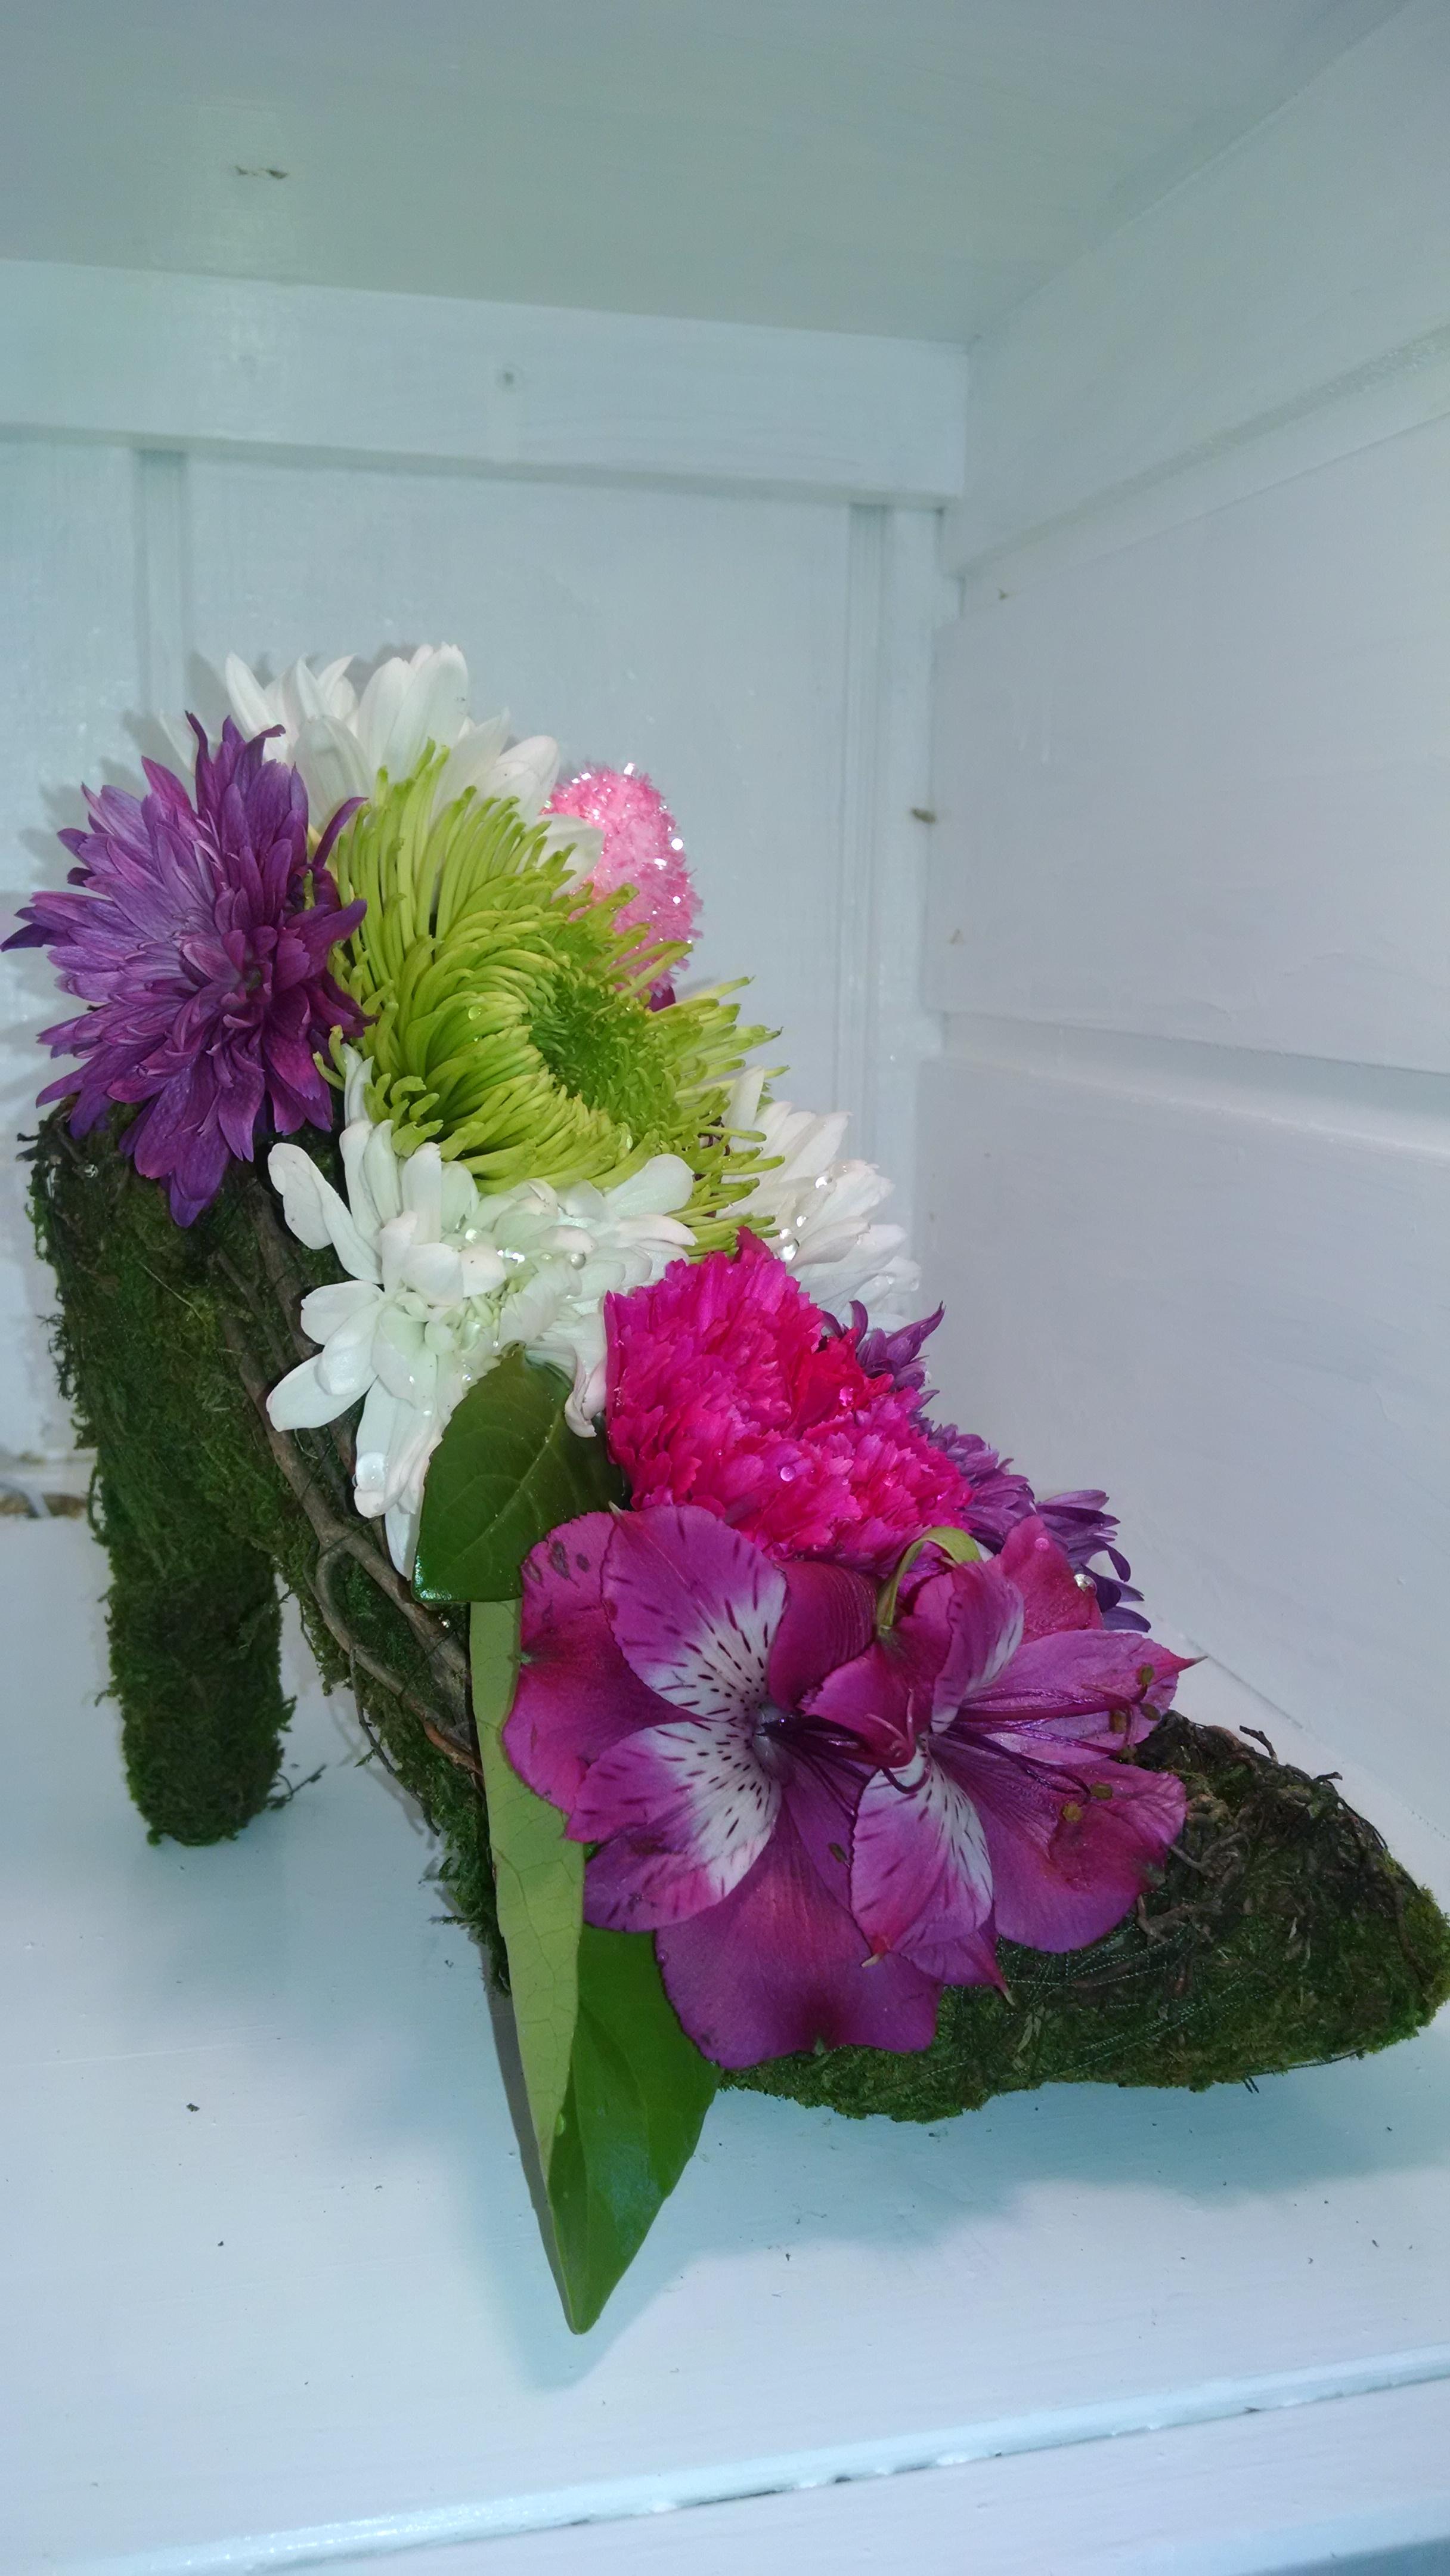 Designing A Garden Market Html on design your garden, japanese zen garden, designing an office, flower garden,